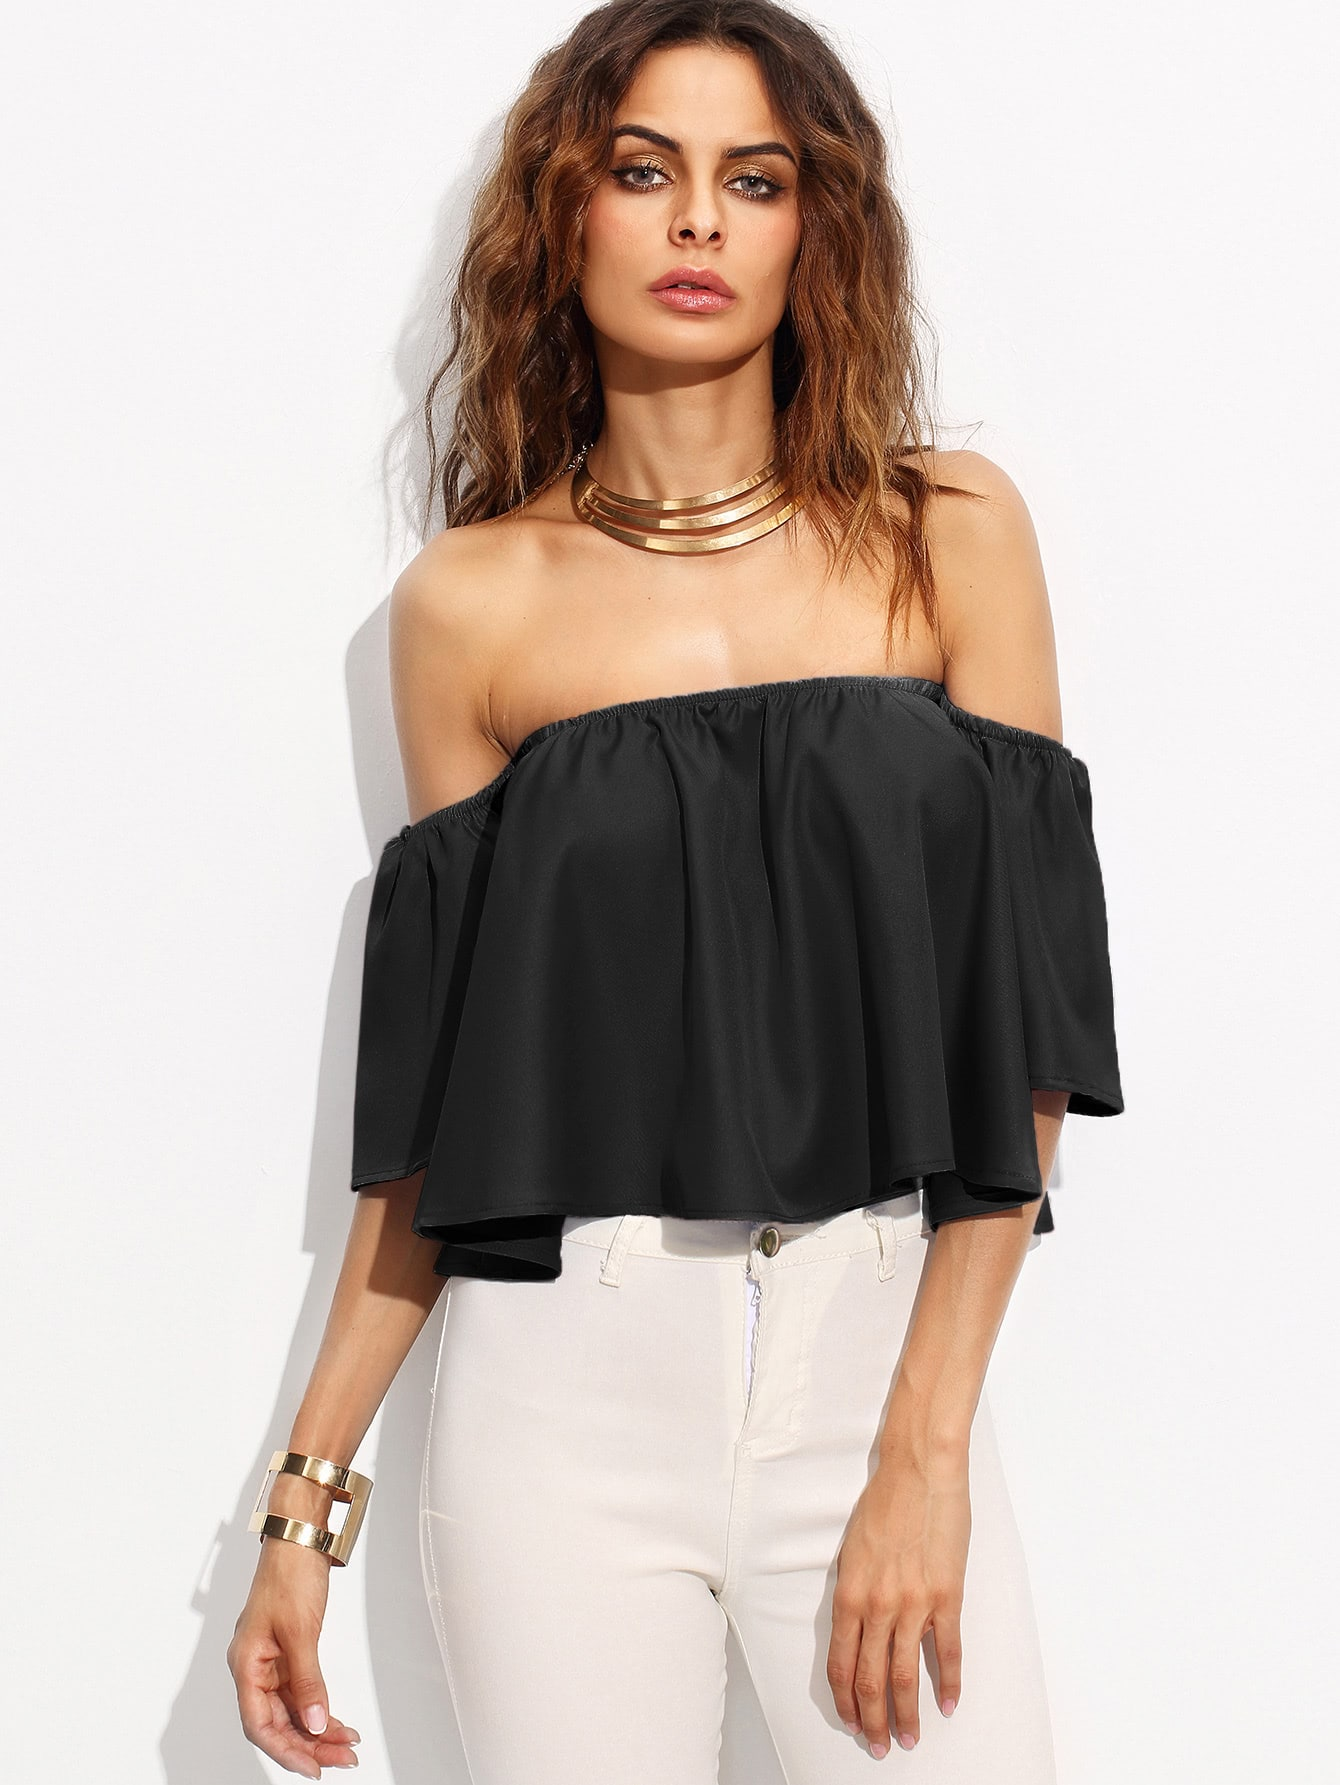 Off Shoulder Crop Top blouse170329101